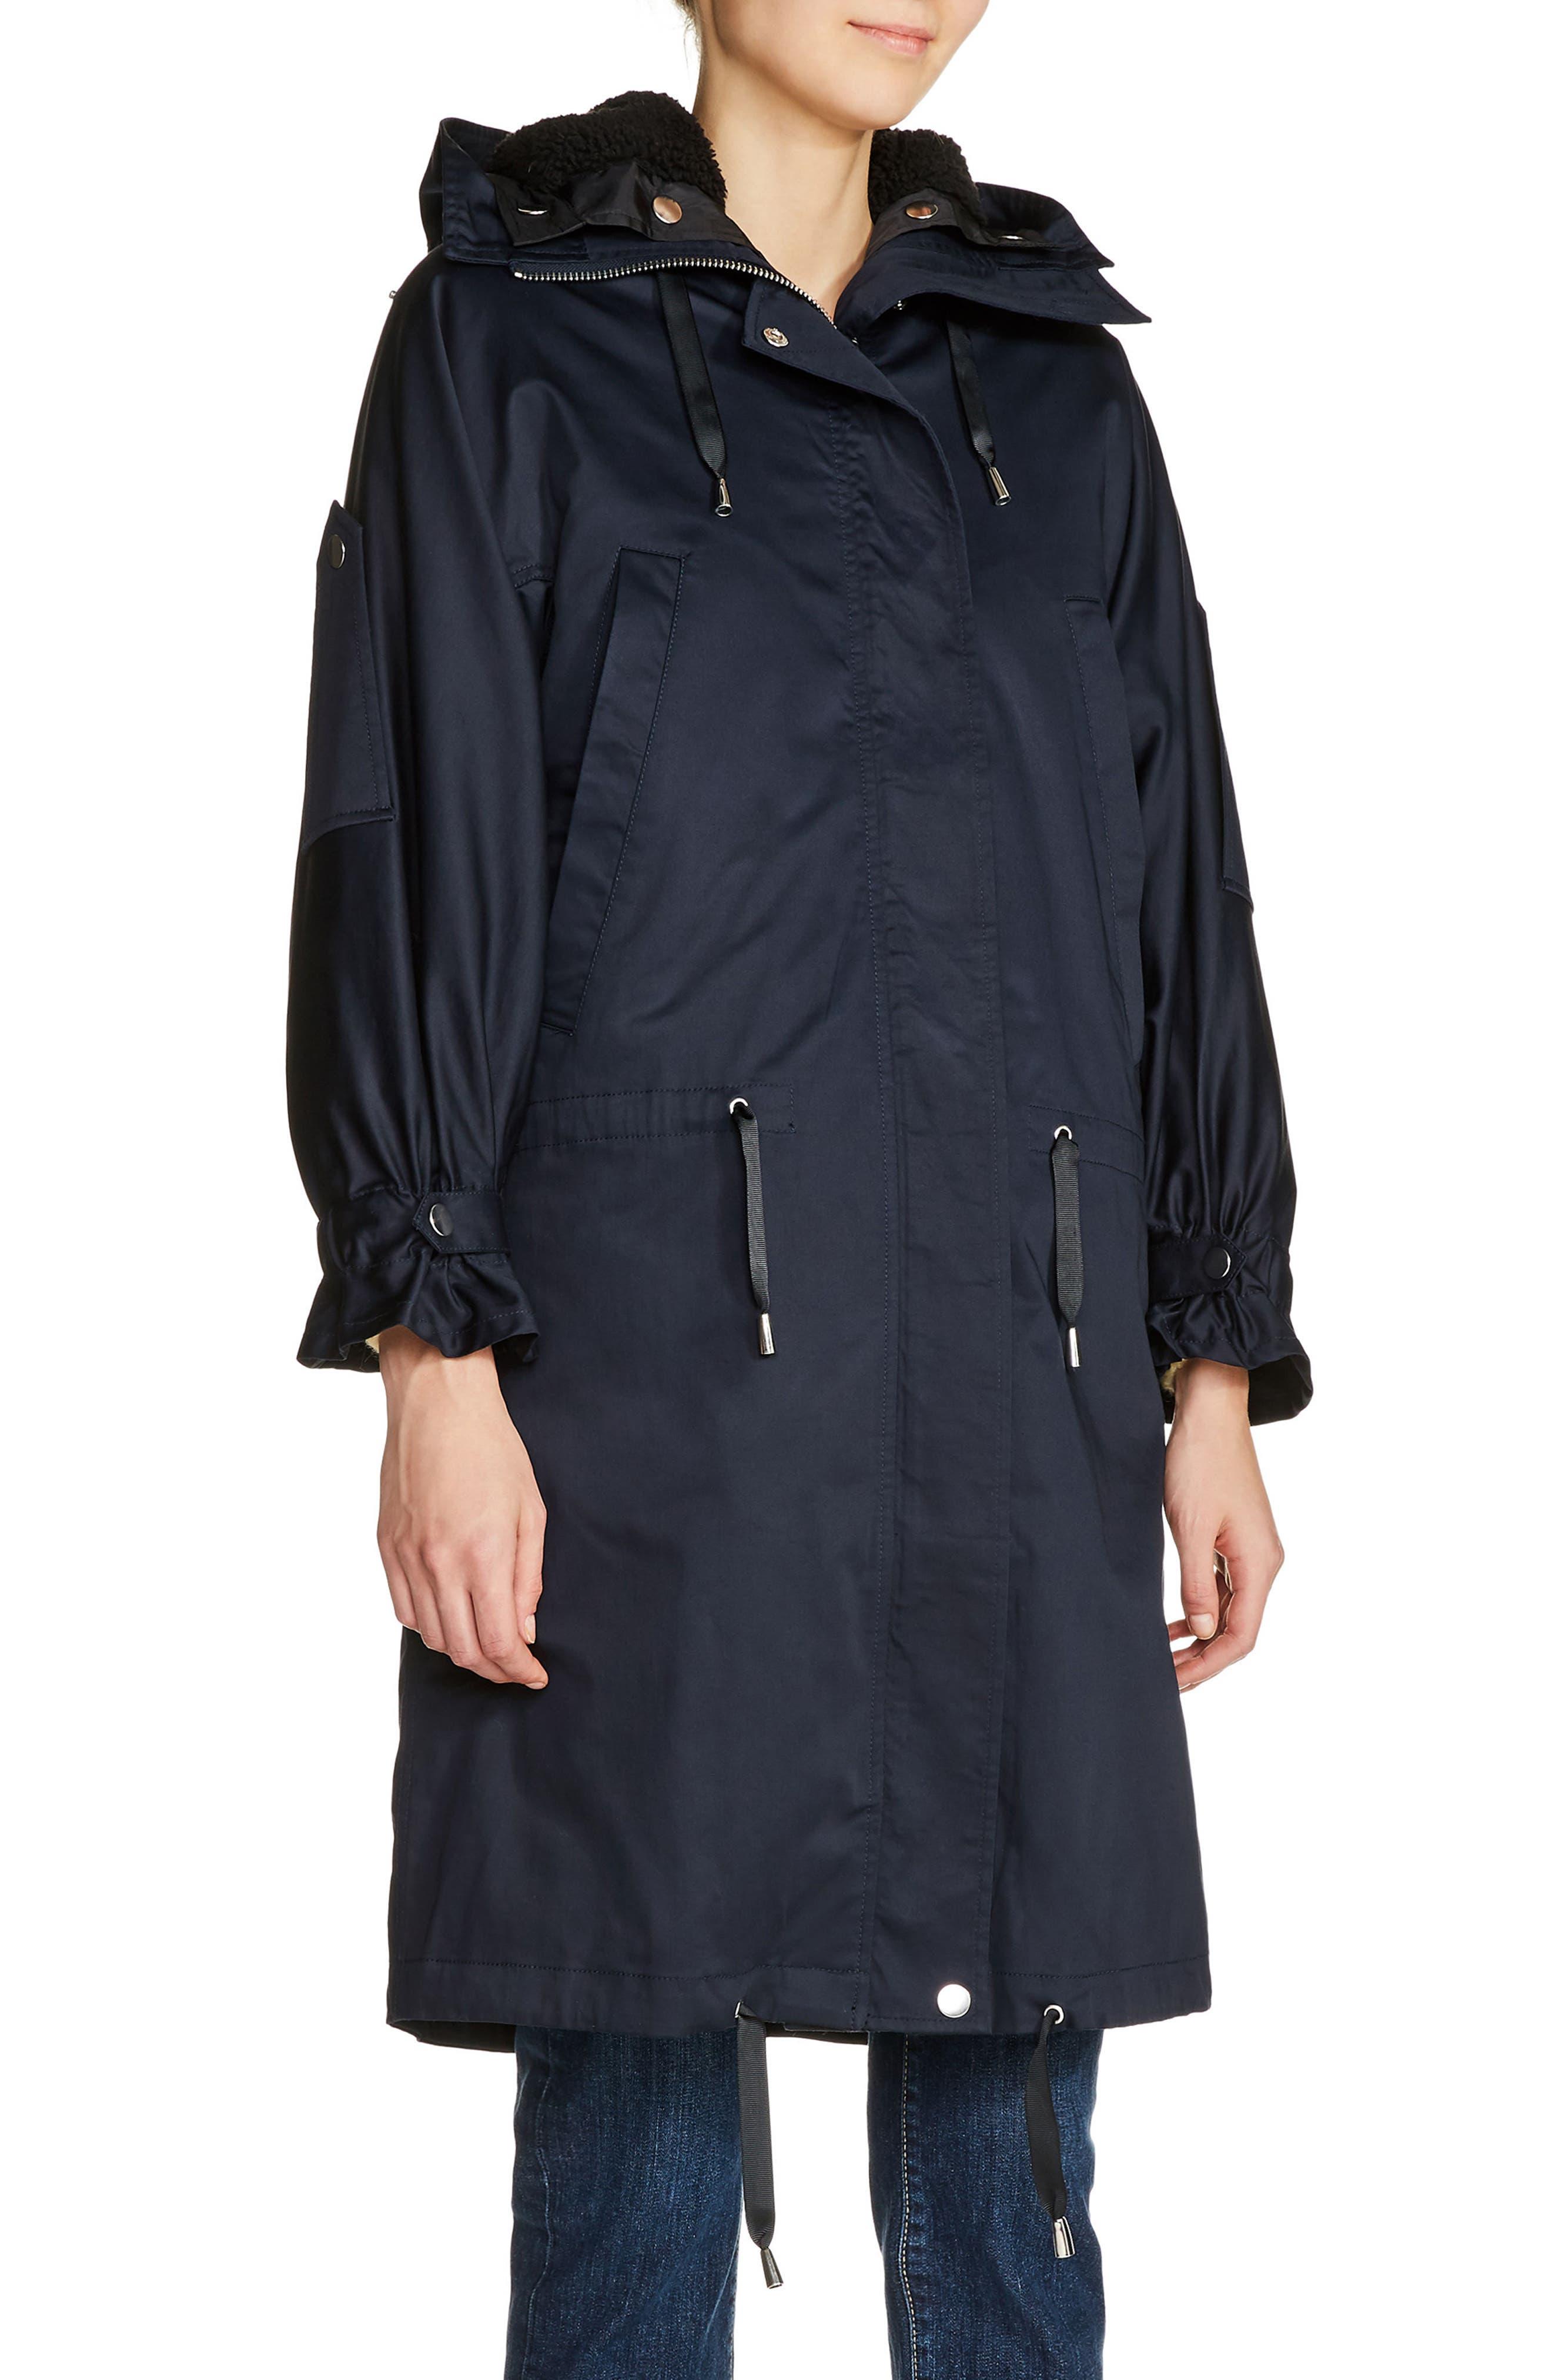 Faux Shearling Lined Long Raincoat,                             Main thumbnail 1, color,                             400